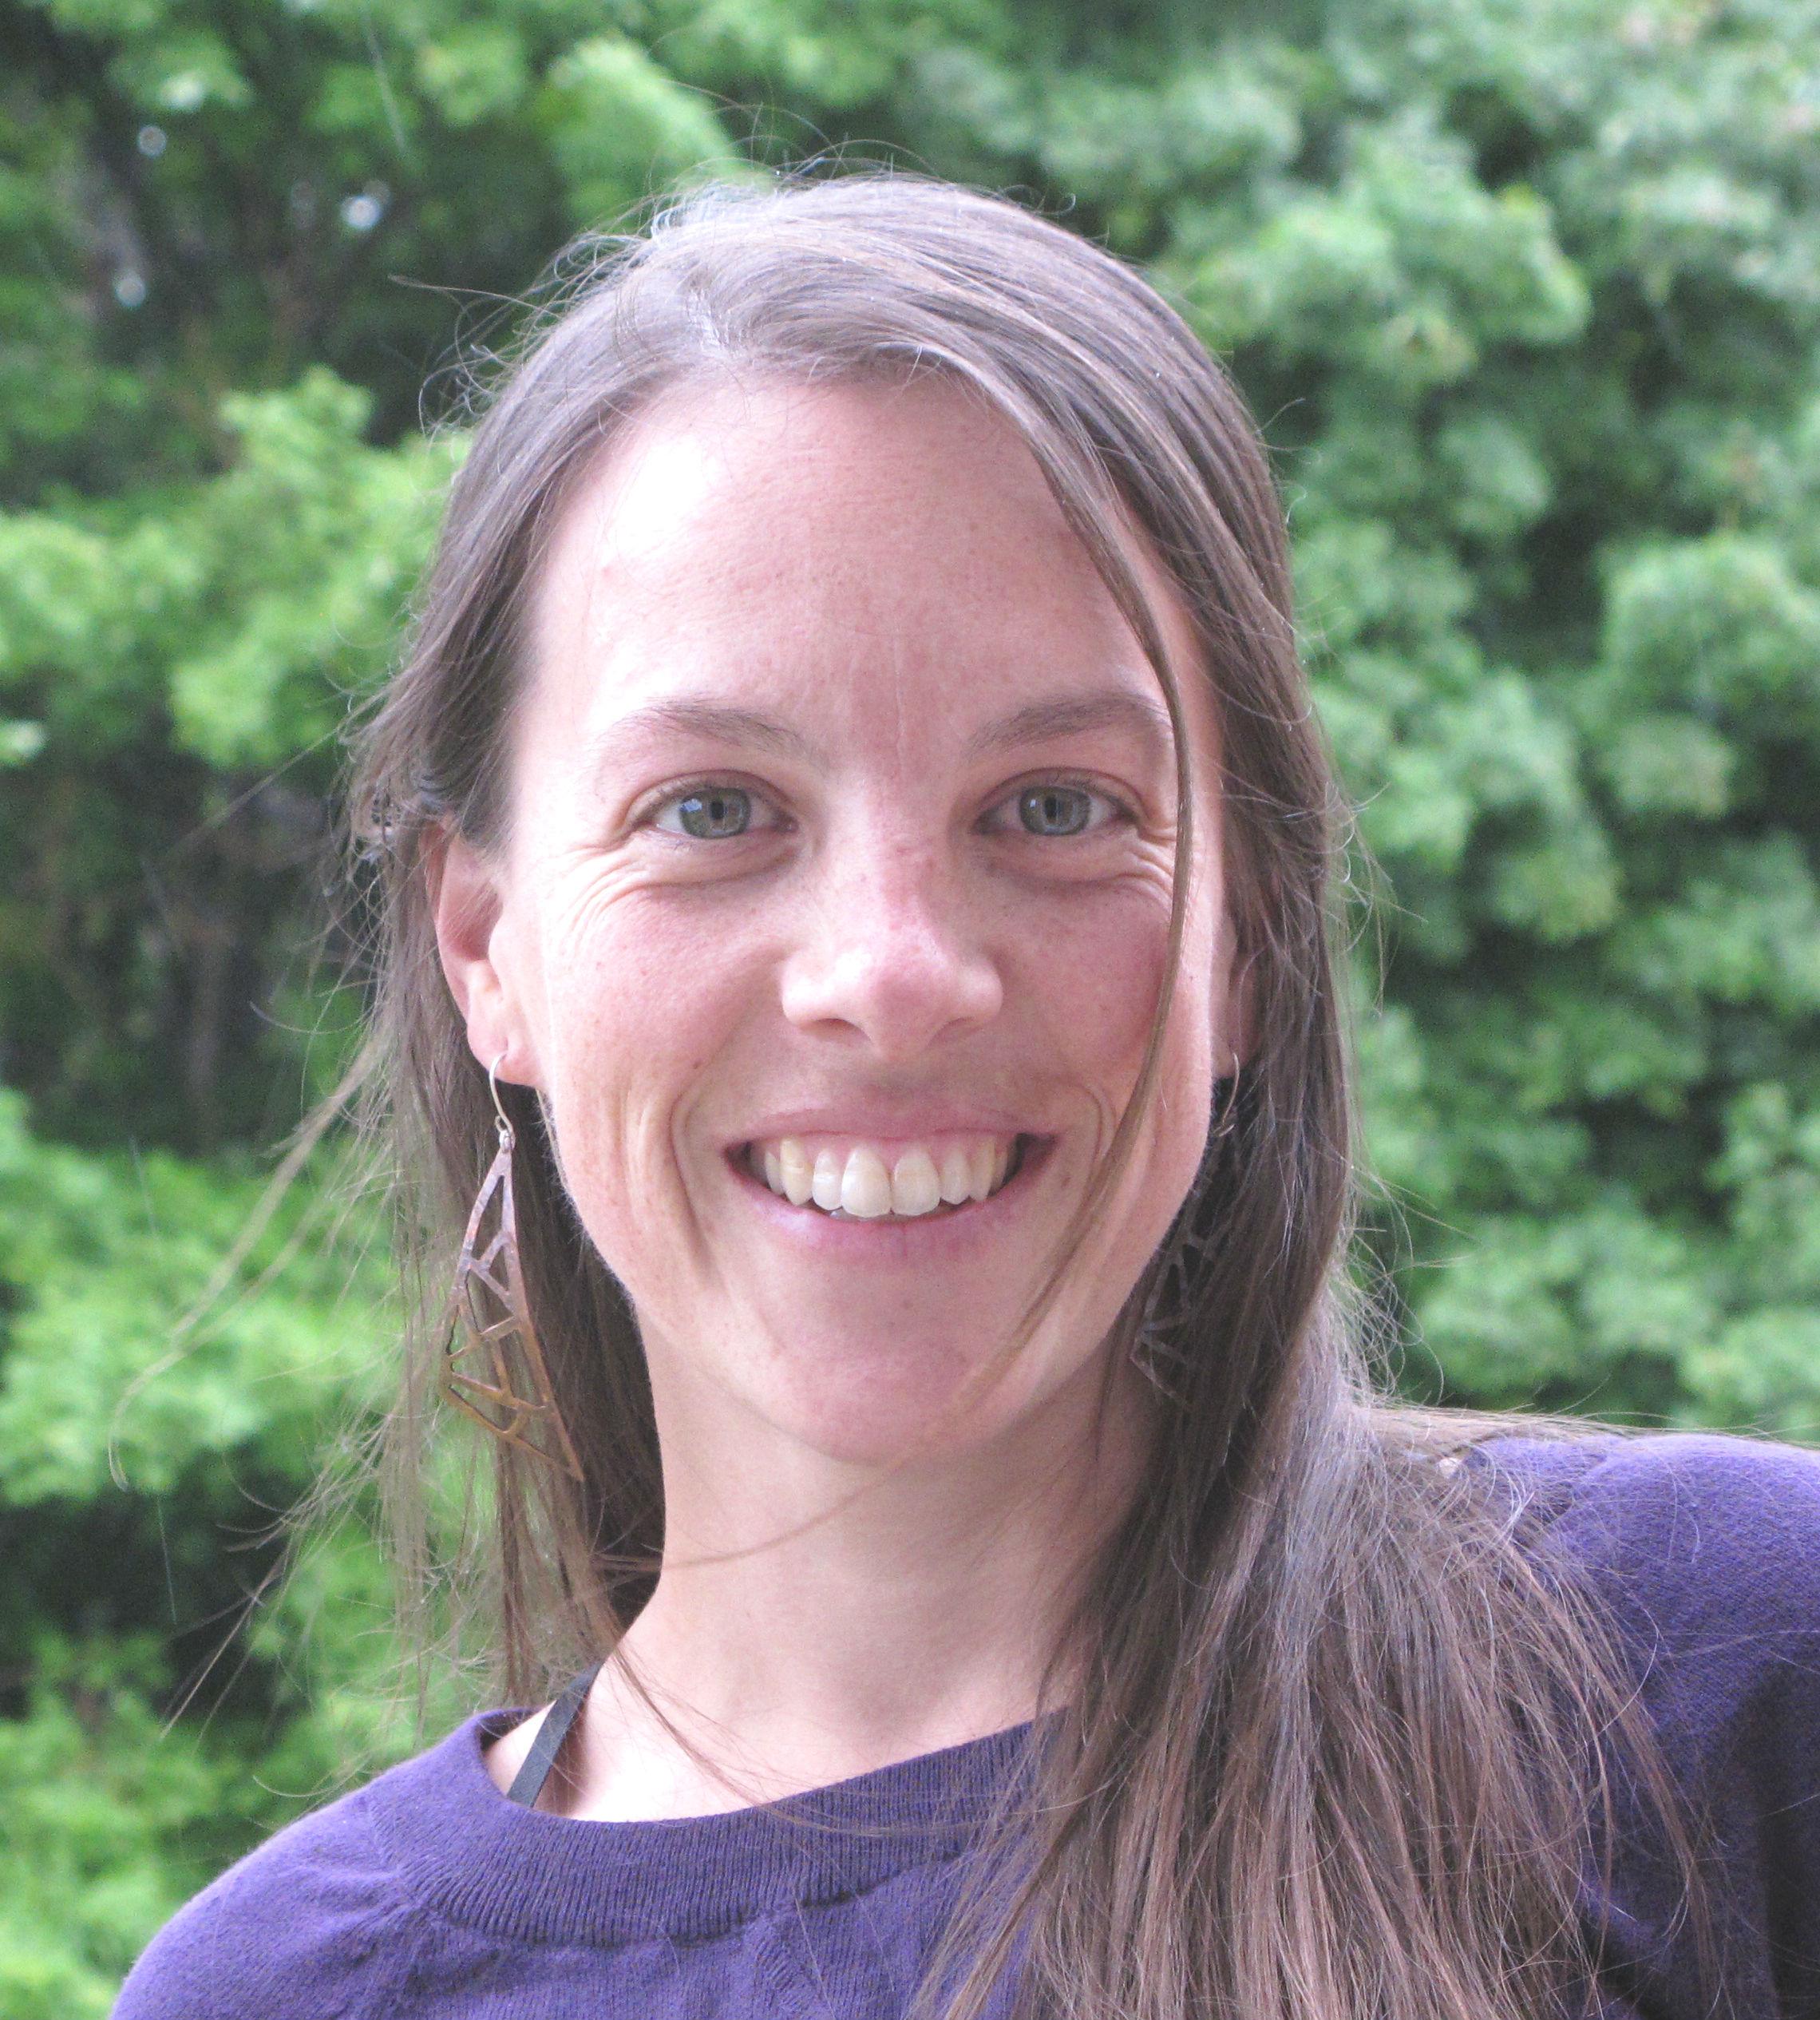 Megan Burnside - Trained Birth Doula                                              902-940-5961                     burnside.meg@gmail.com